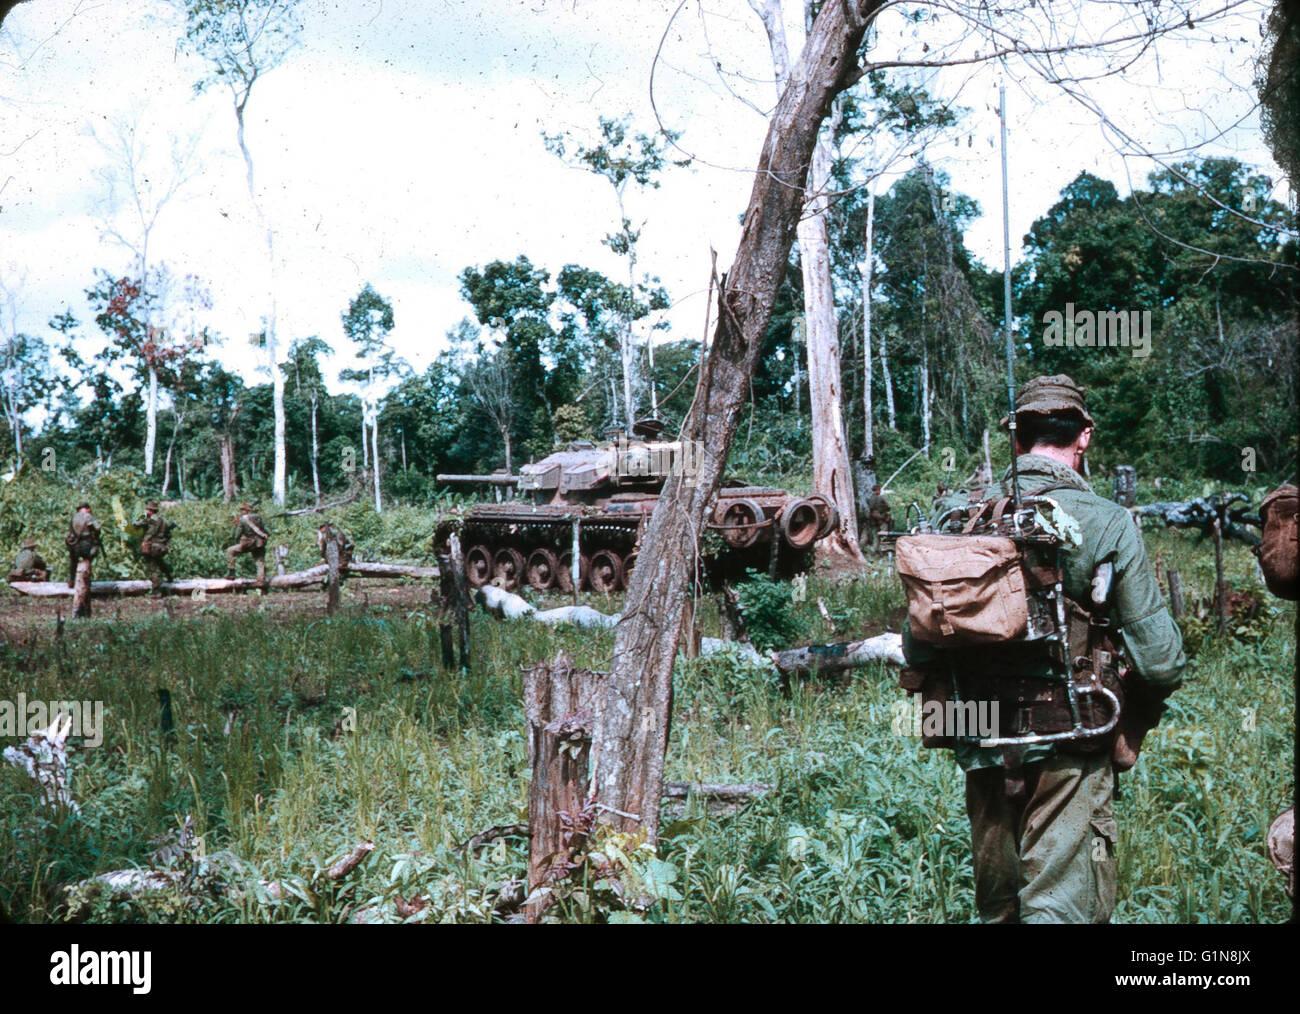 Vietnam War 1954-1975 Australian-infantry-5th-battalion-and-centurion-tank-on-patrol-south-G1N8JX